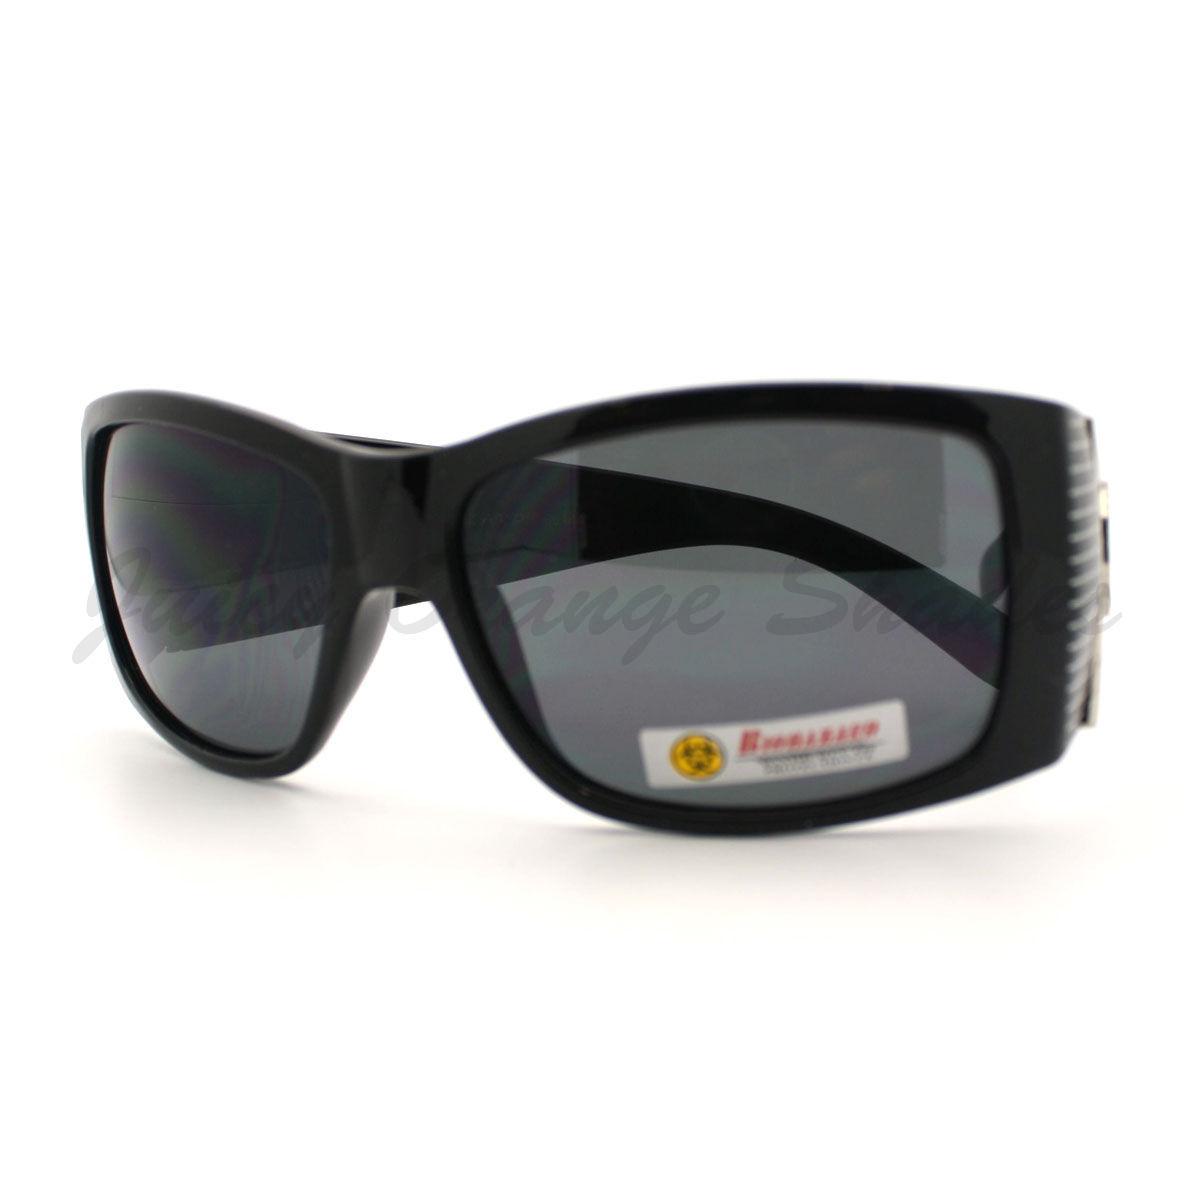 8fe7857ba1c t2ec16zhjgke9no8illrbrudubnimw 60 57. t2ec16zhjgke9no8illrbrudubnimw 60 57.  Previous. Mens Biohazard Sunglasses Skater ...